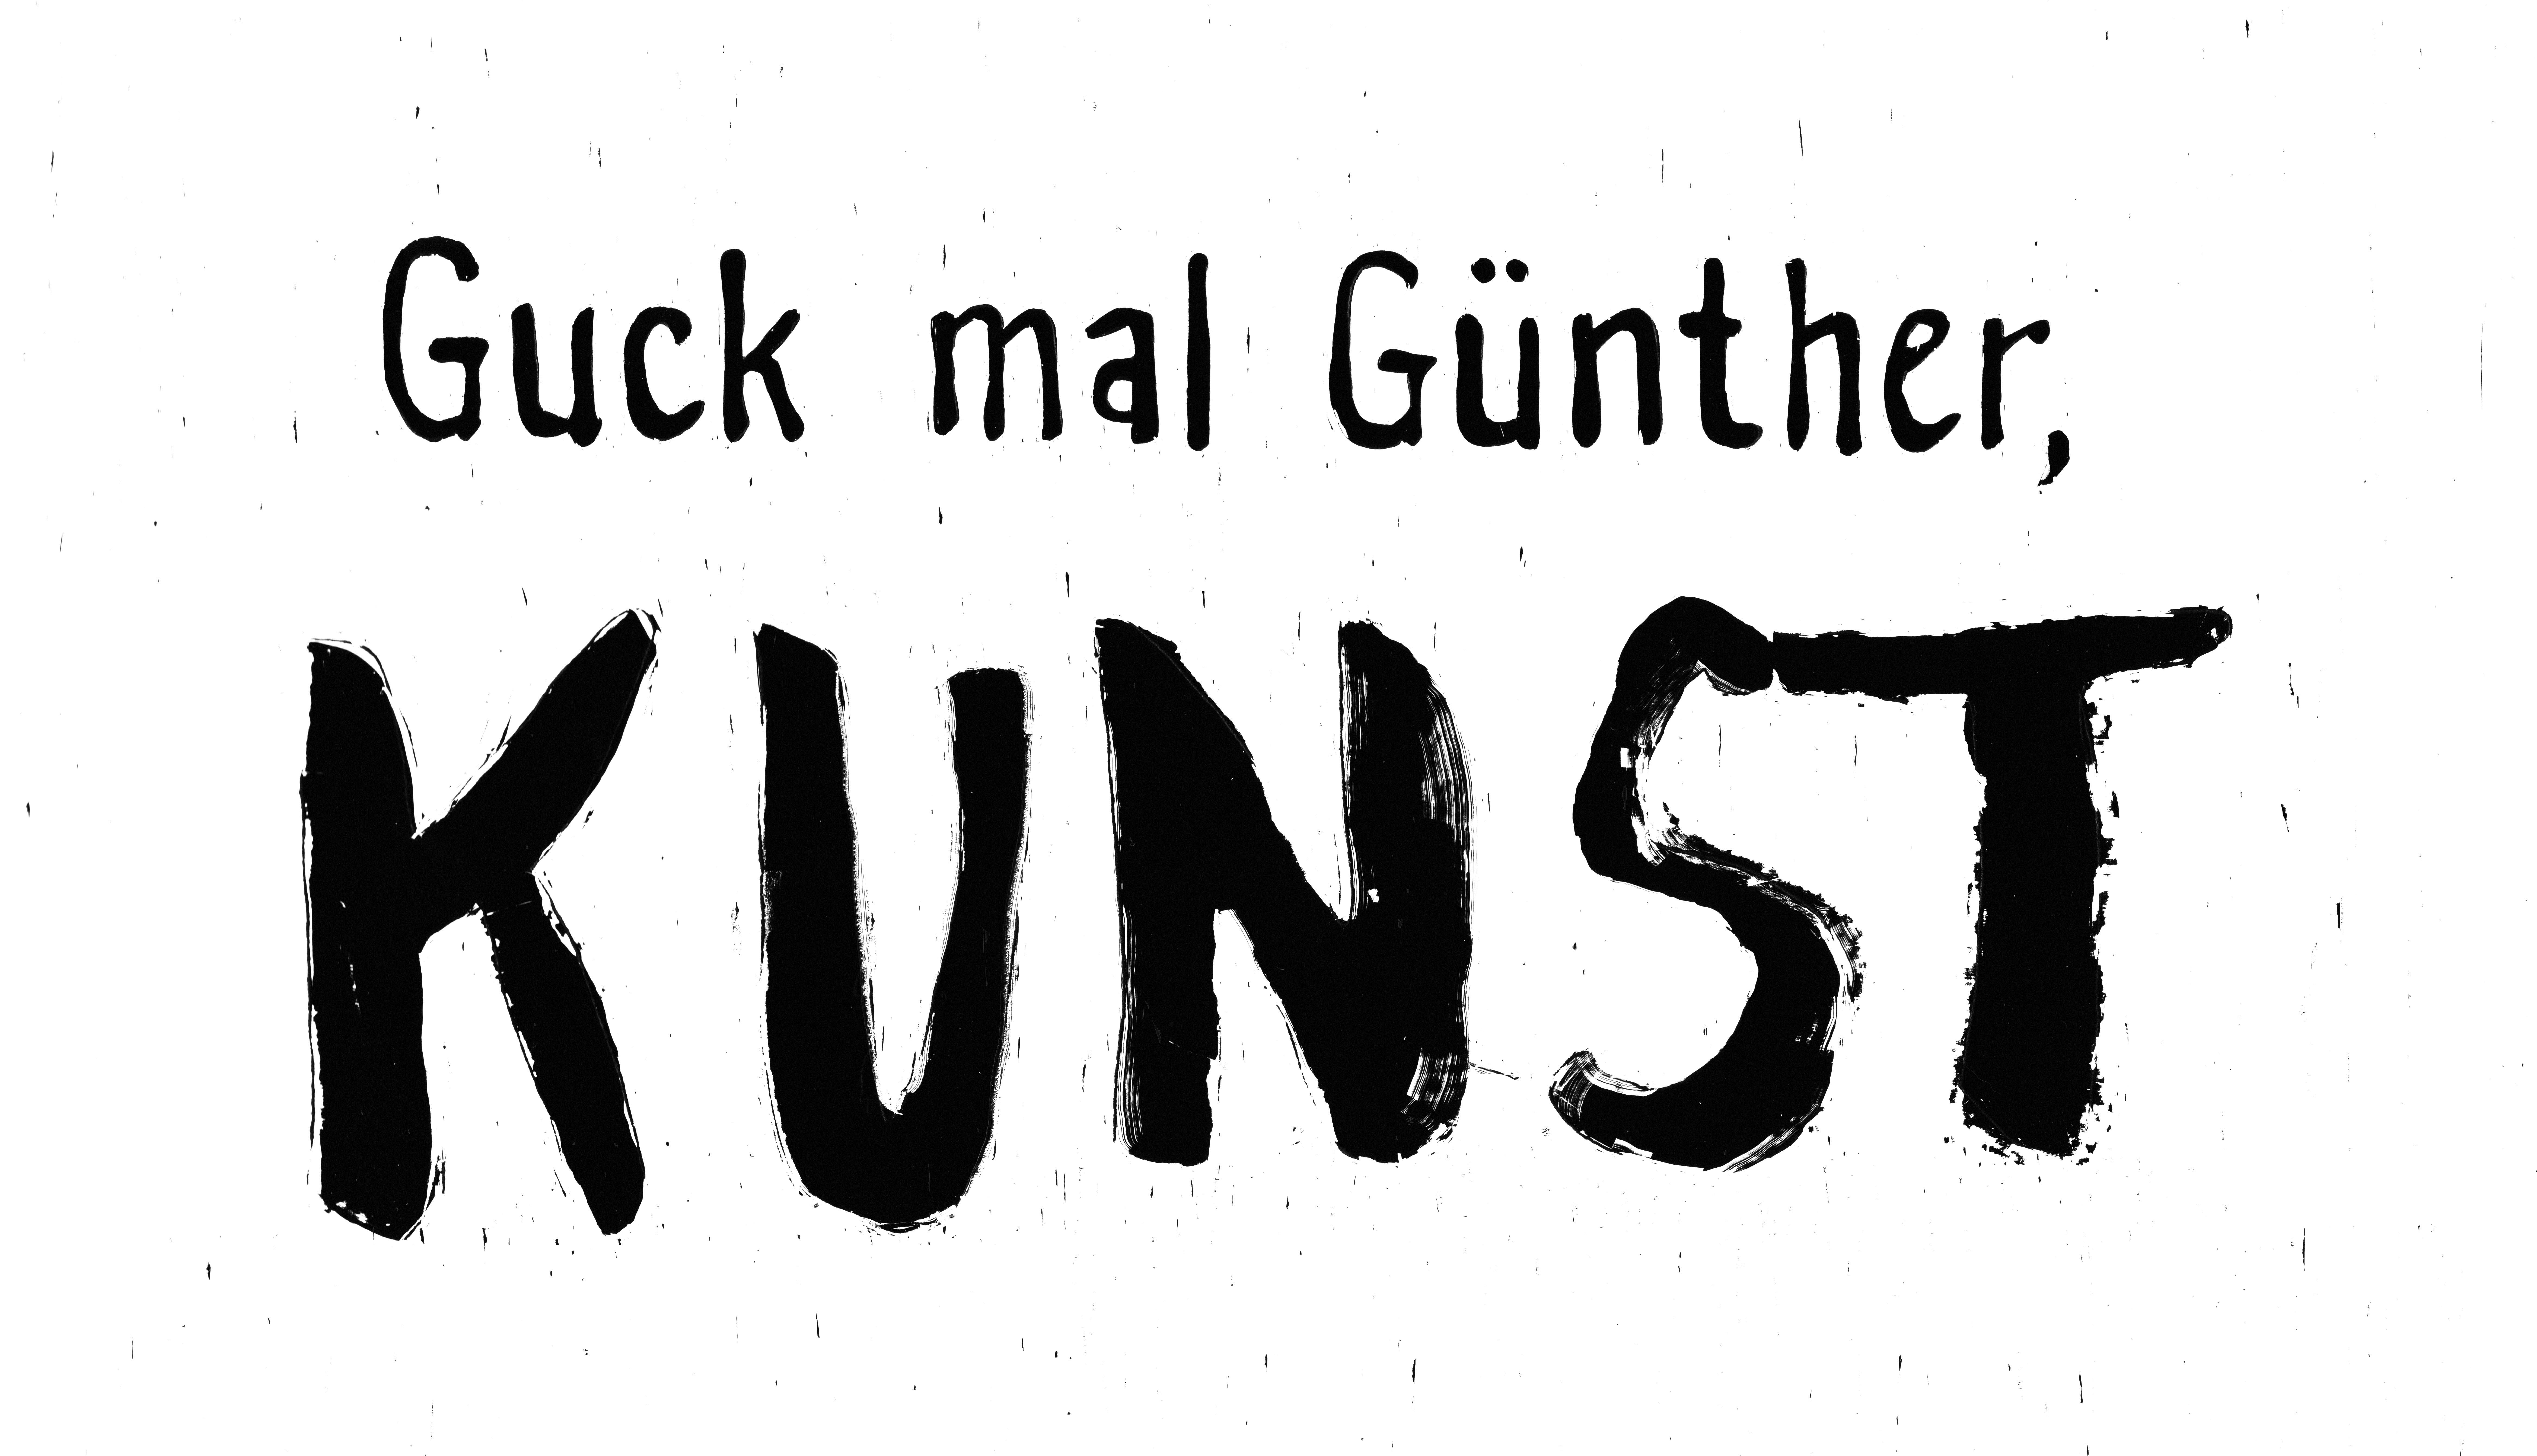 Guck mal Günther Kunst